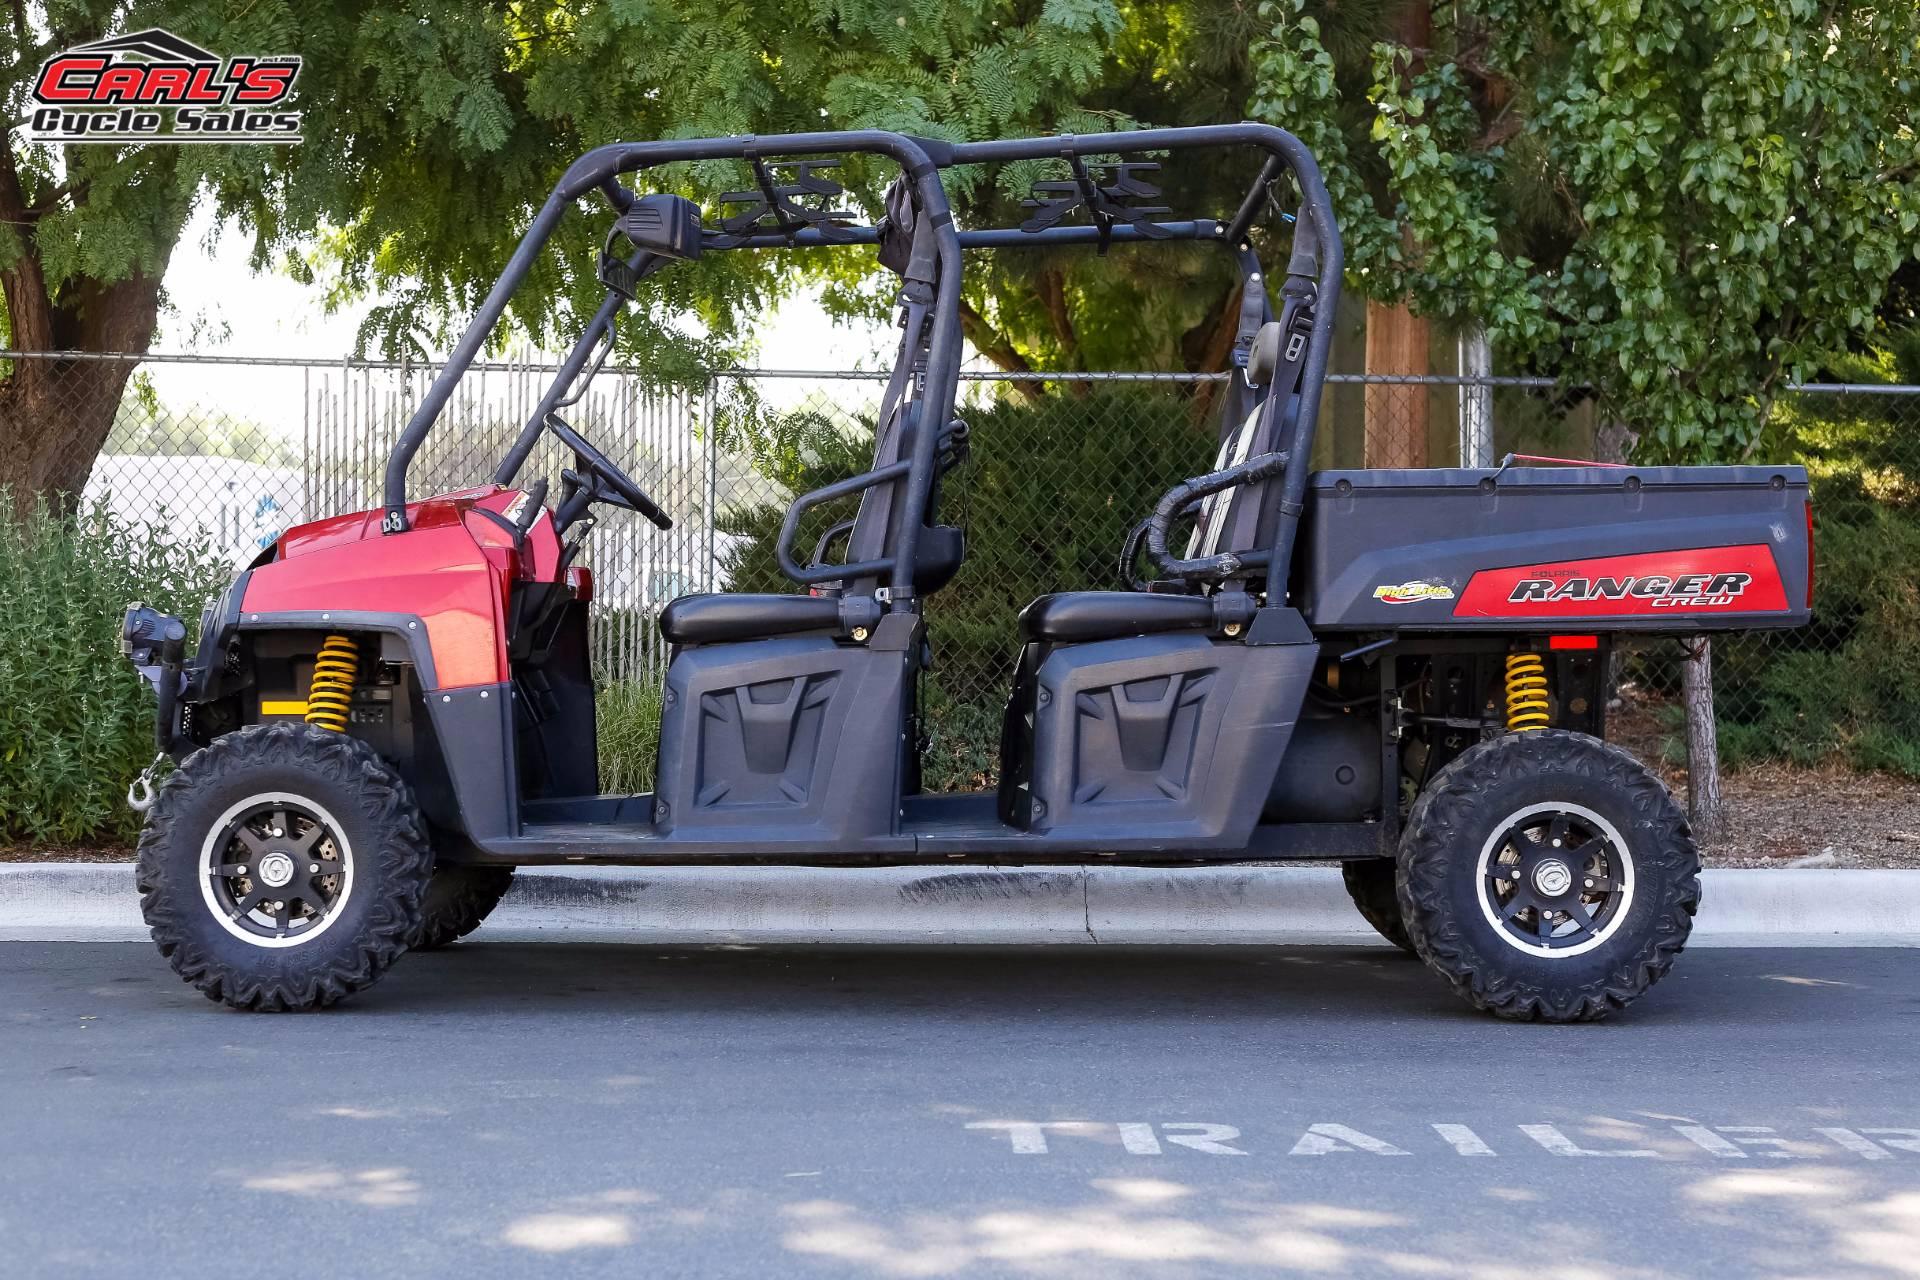 2010 Ranger 800 EFI Crew EPS LE